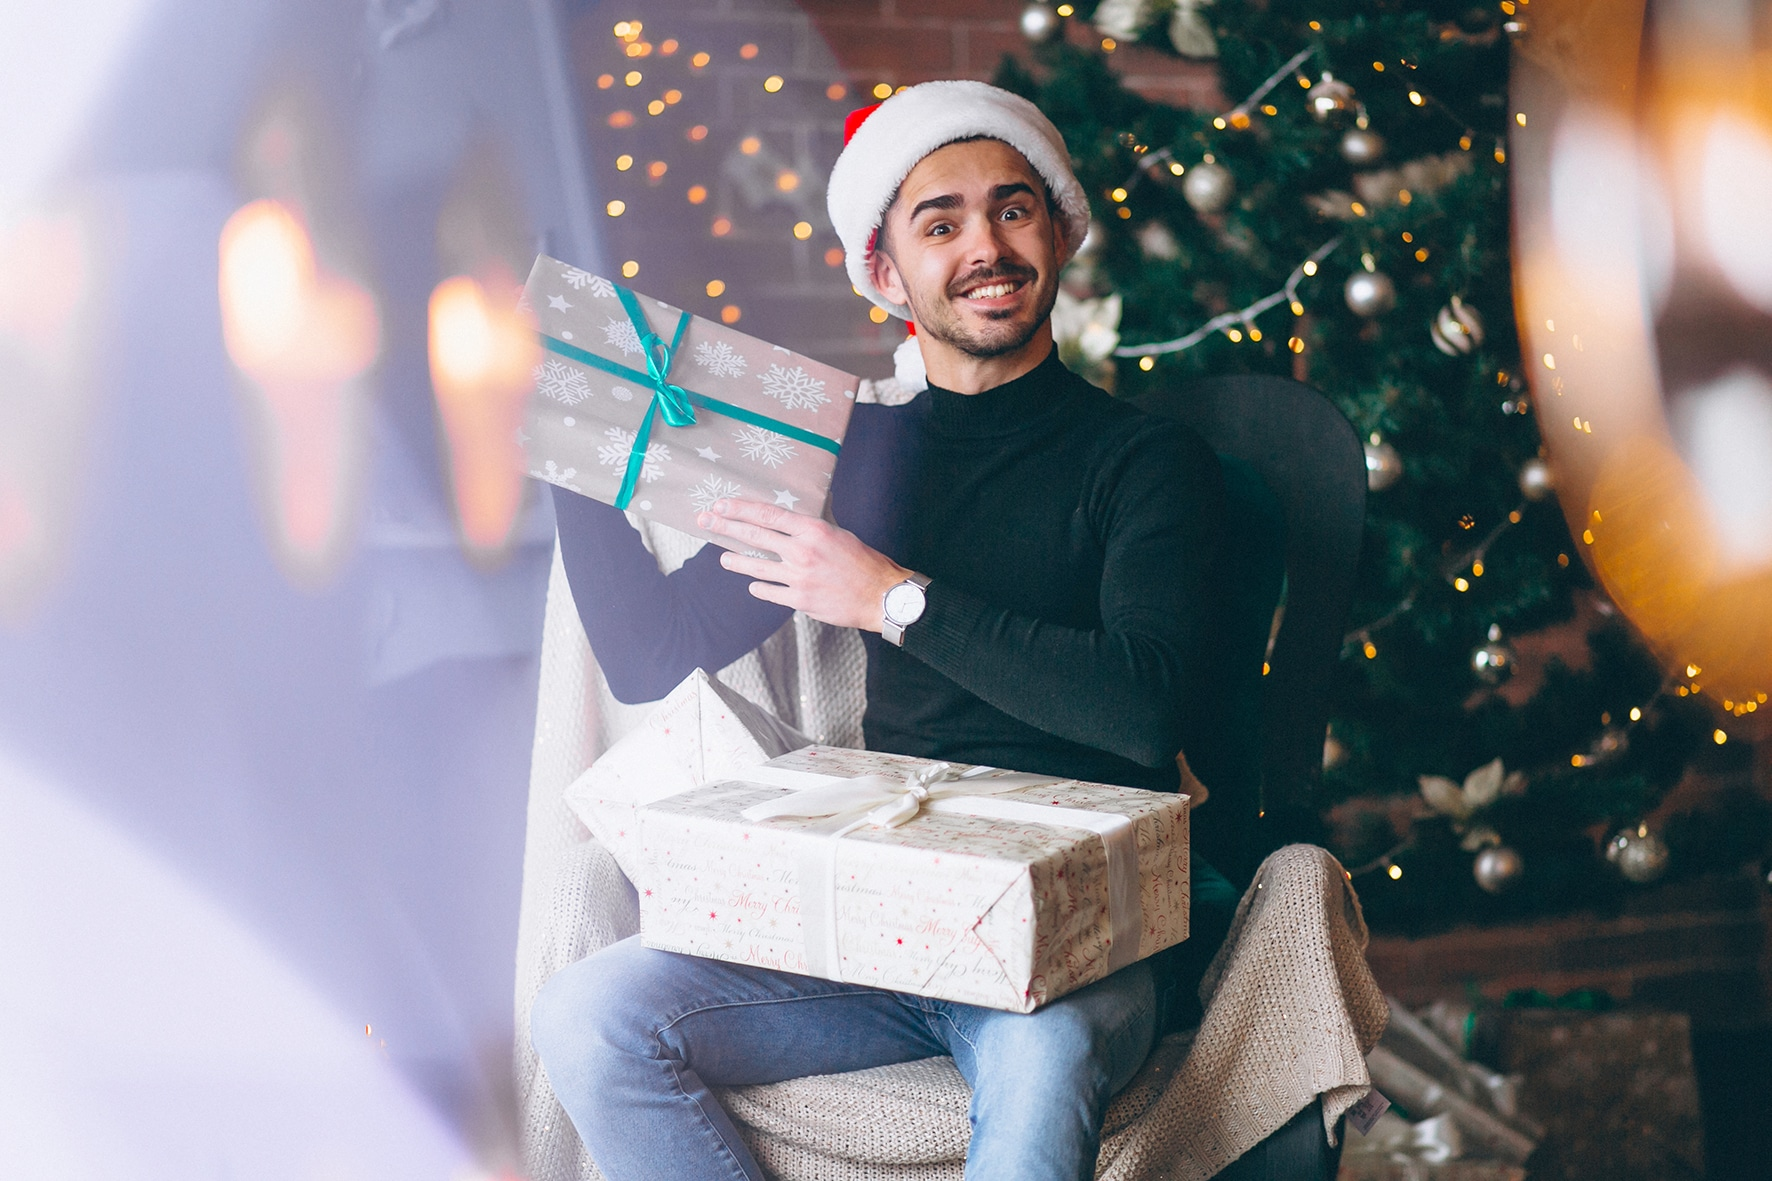 Outfit uomo feste natalizie 2020